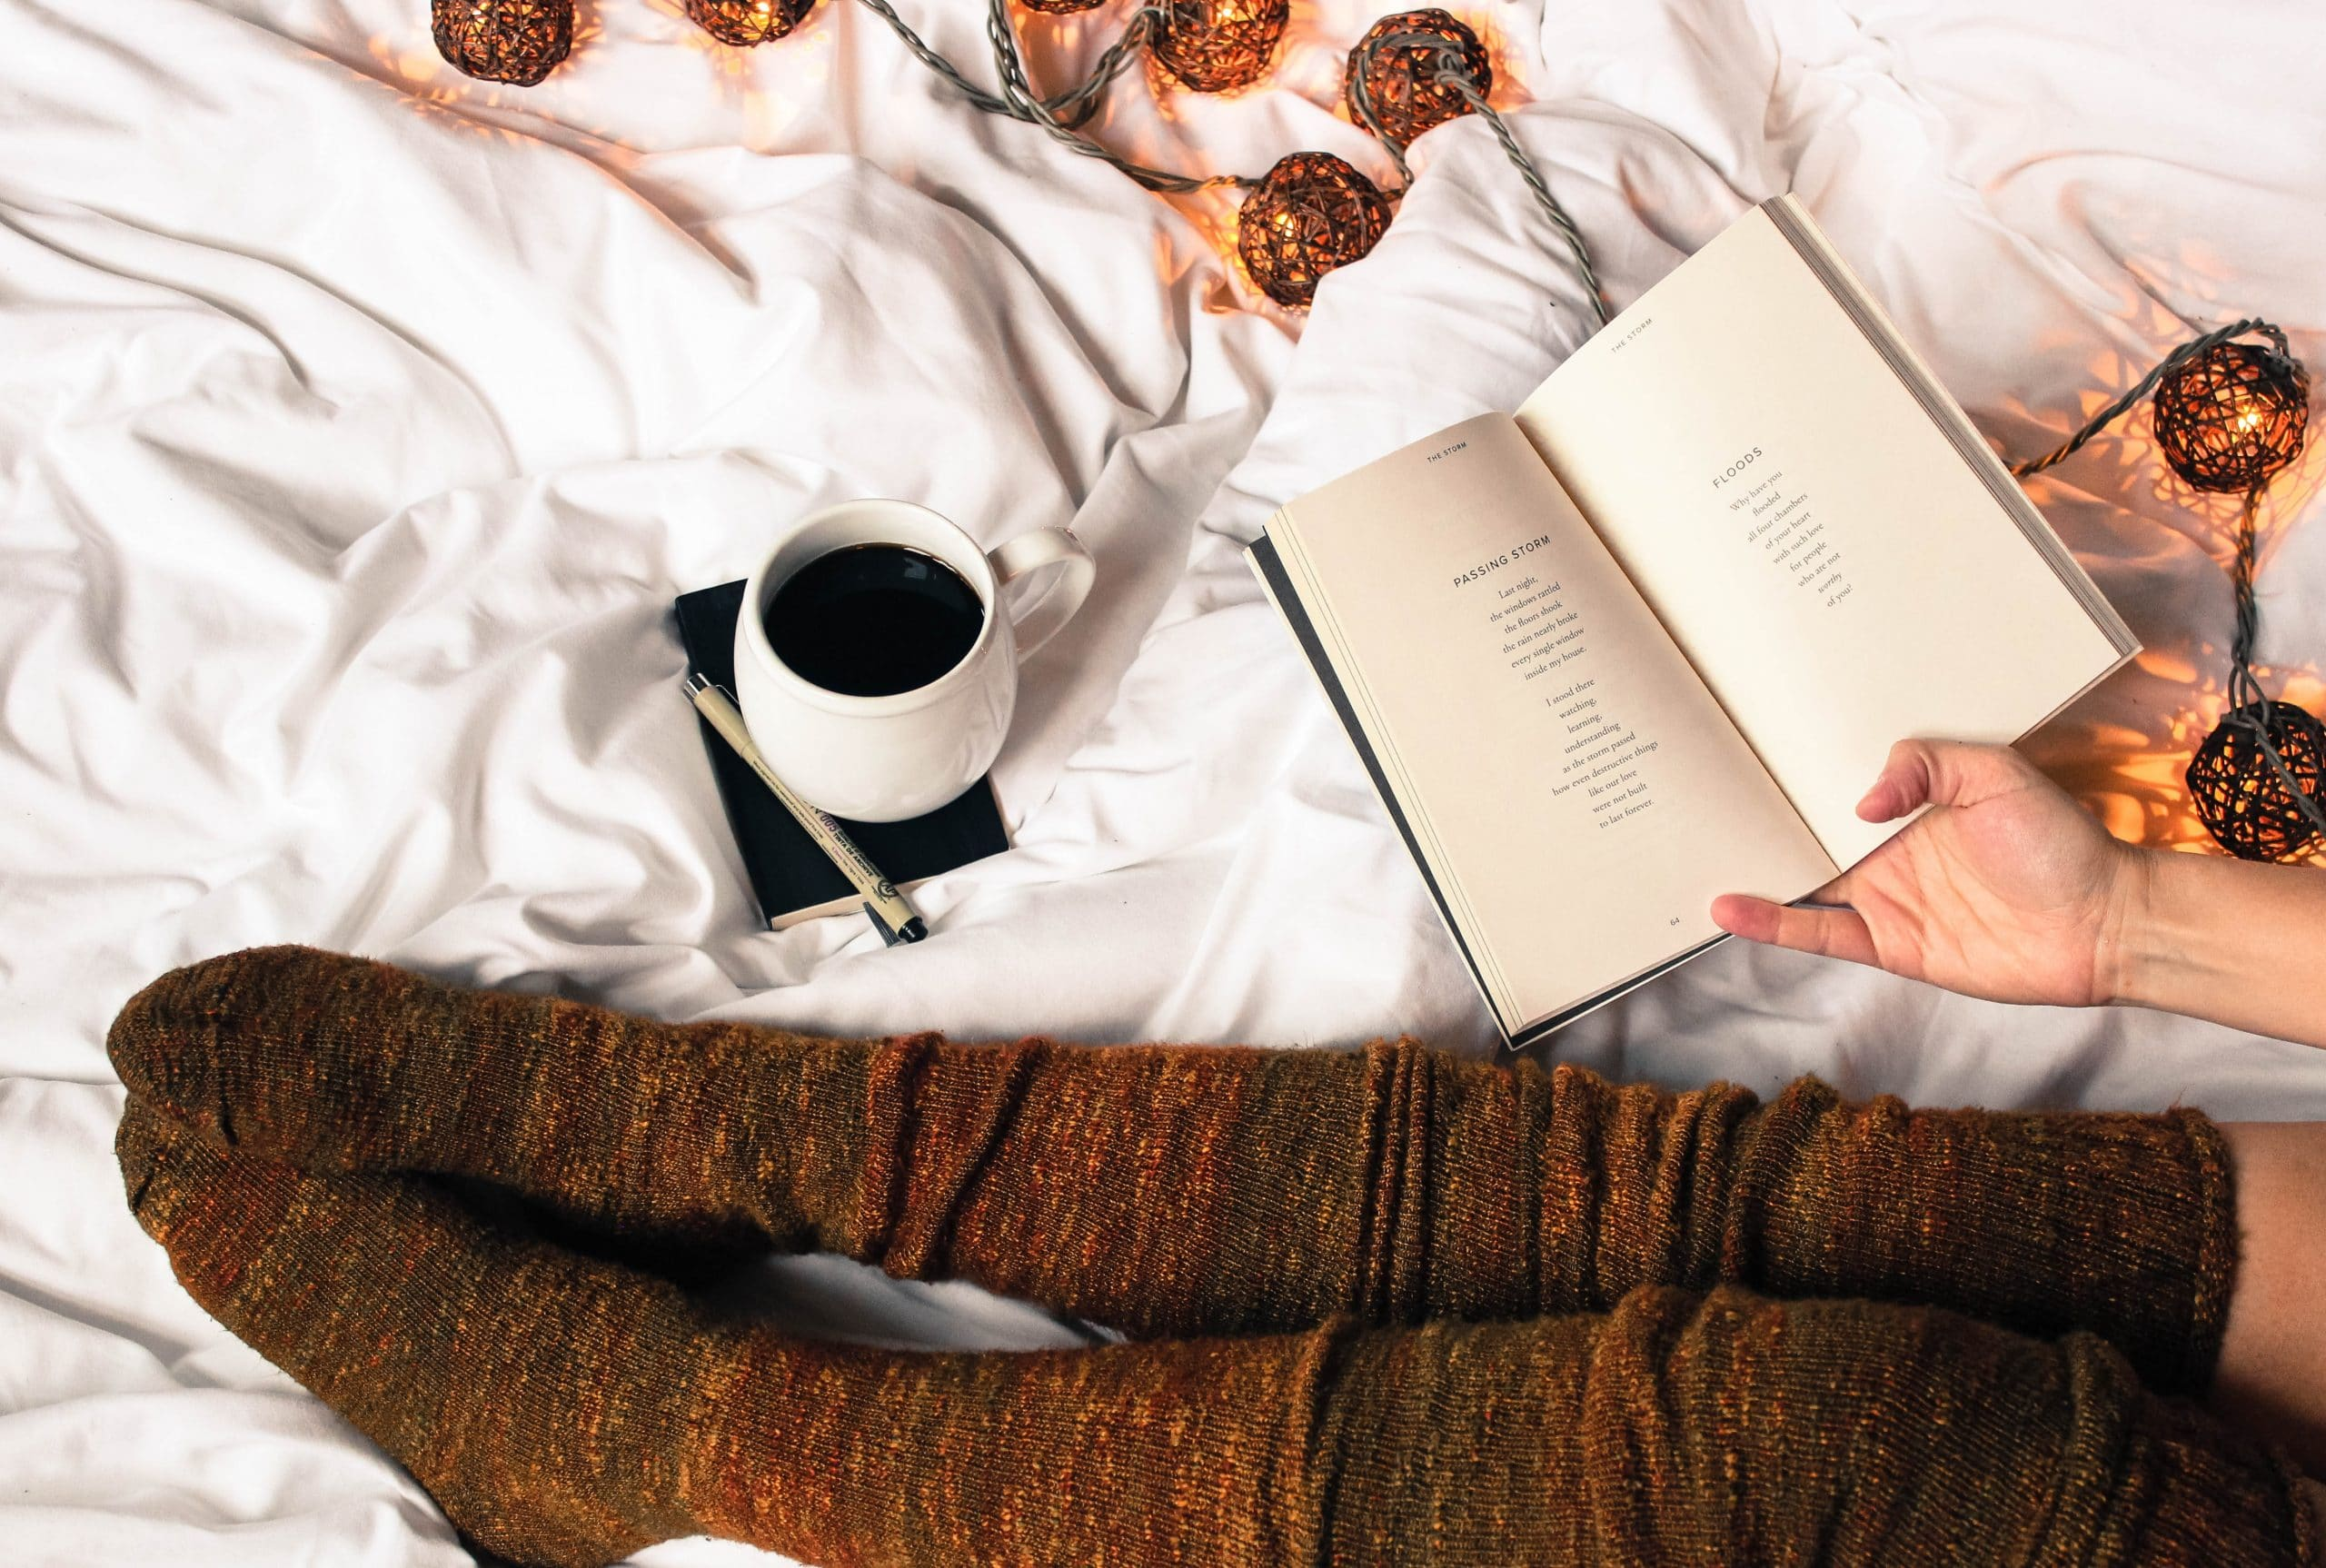 liggen bed koffie boek lampjes sokken dekbed relax